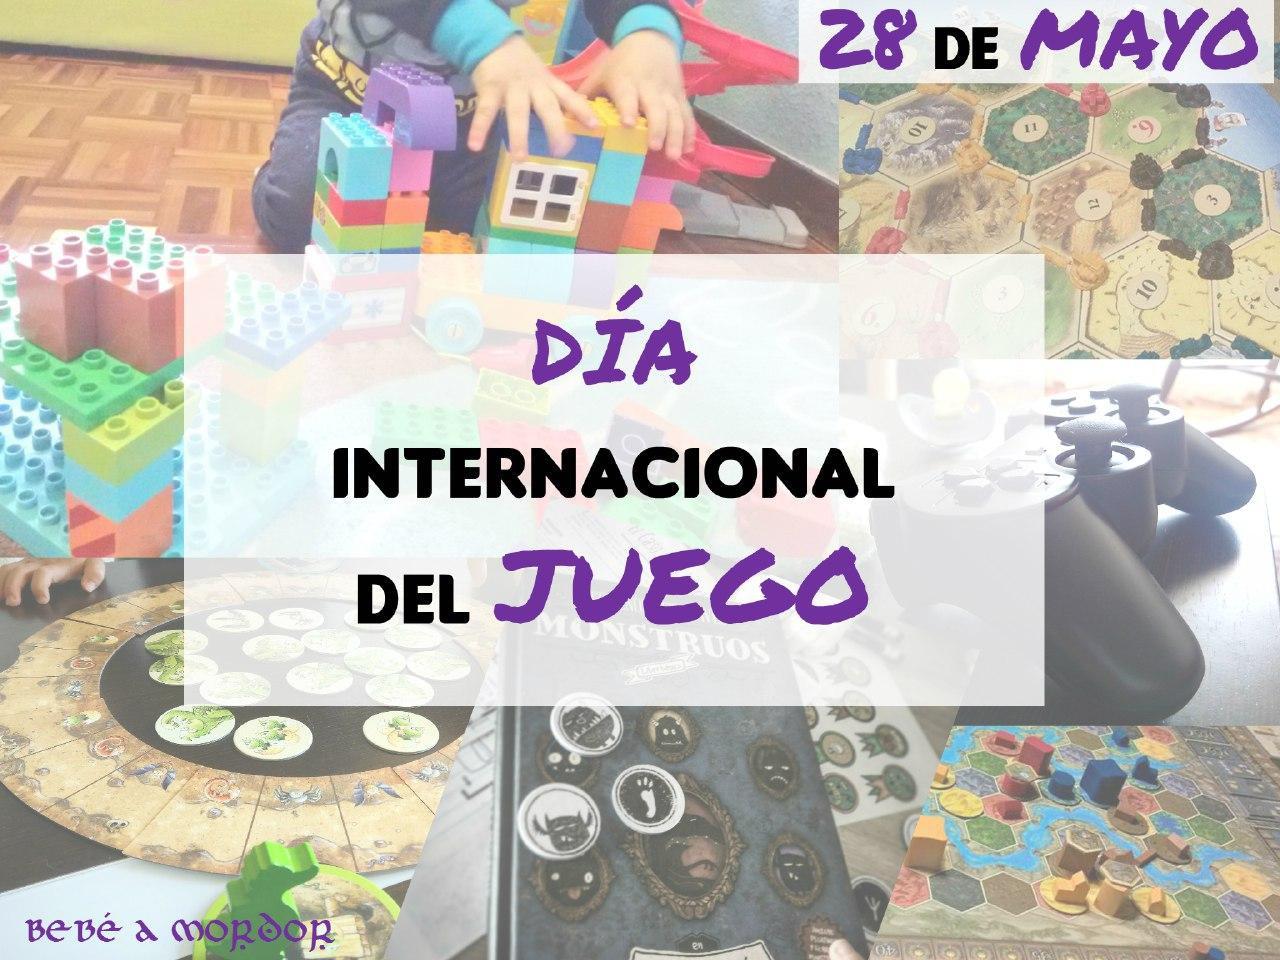 Journée internationale du jeu